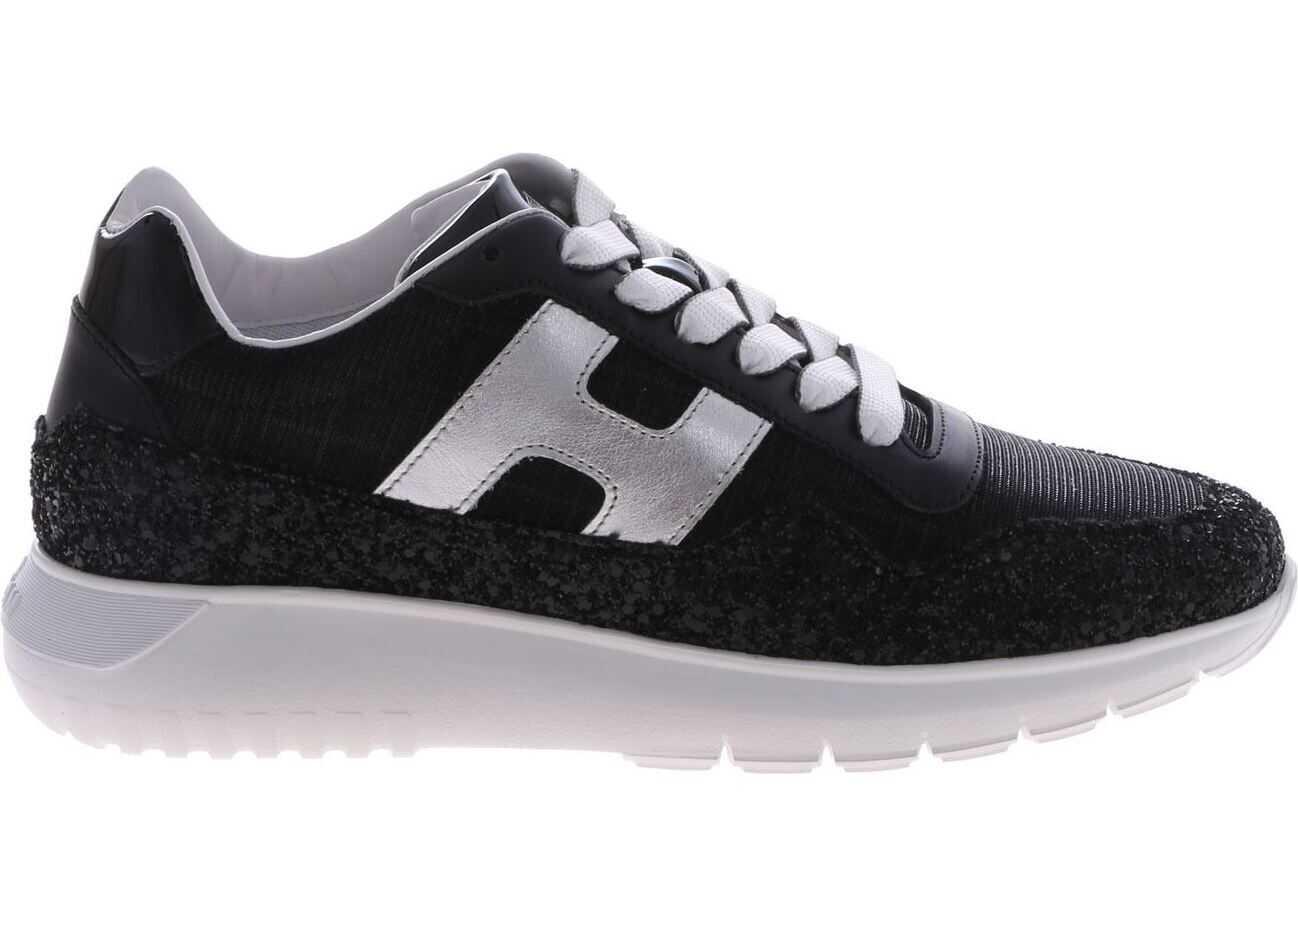 Hogan H371 Interactive 3 Sneakers In Black Black